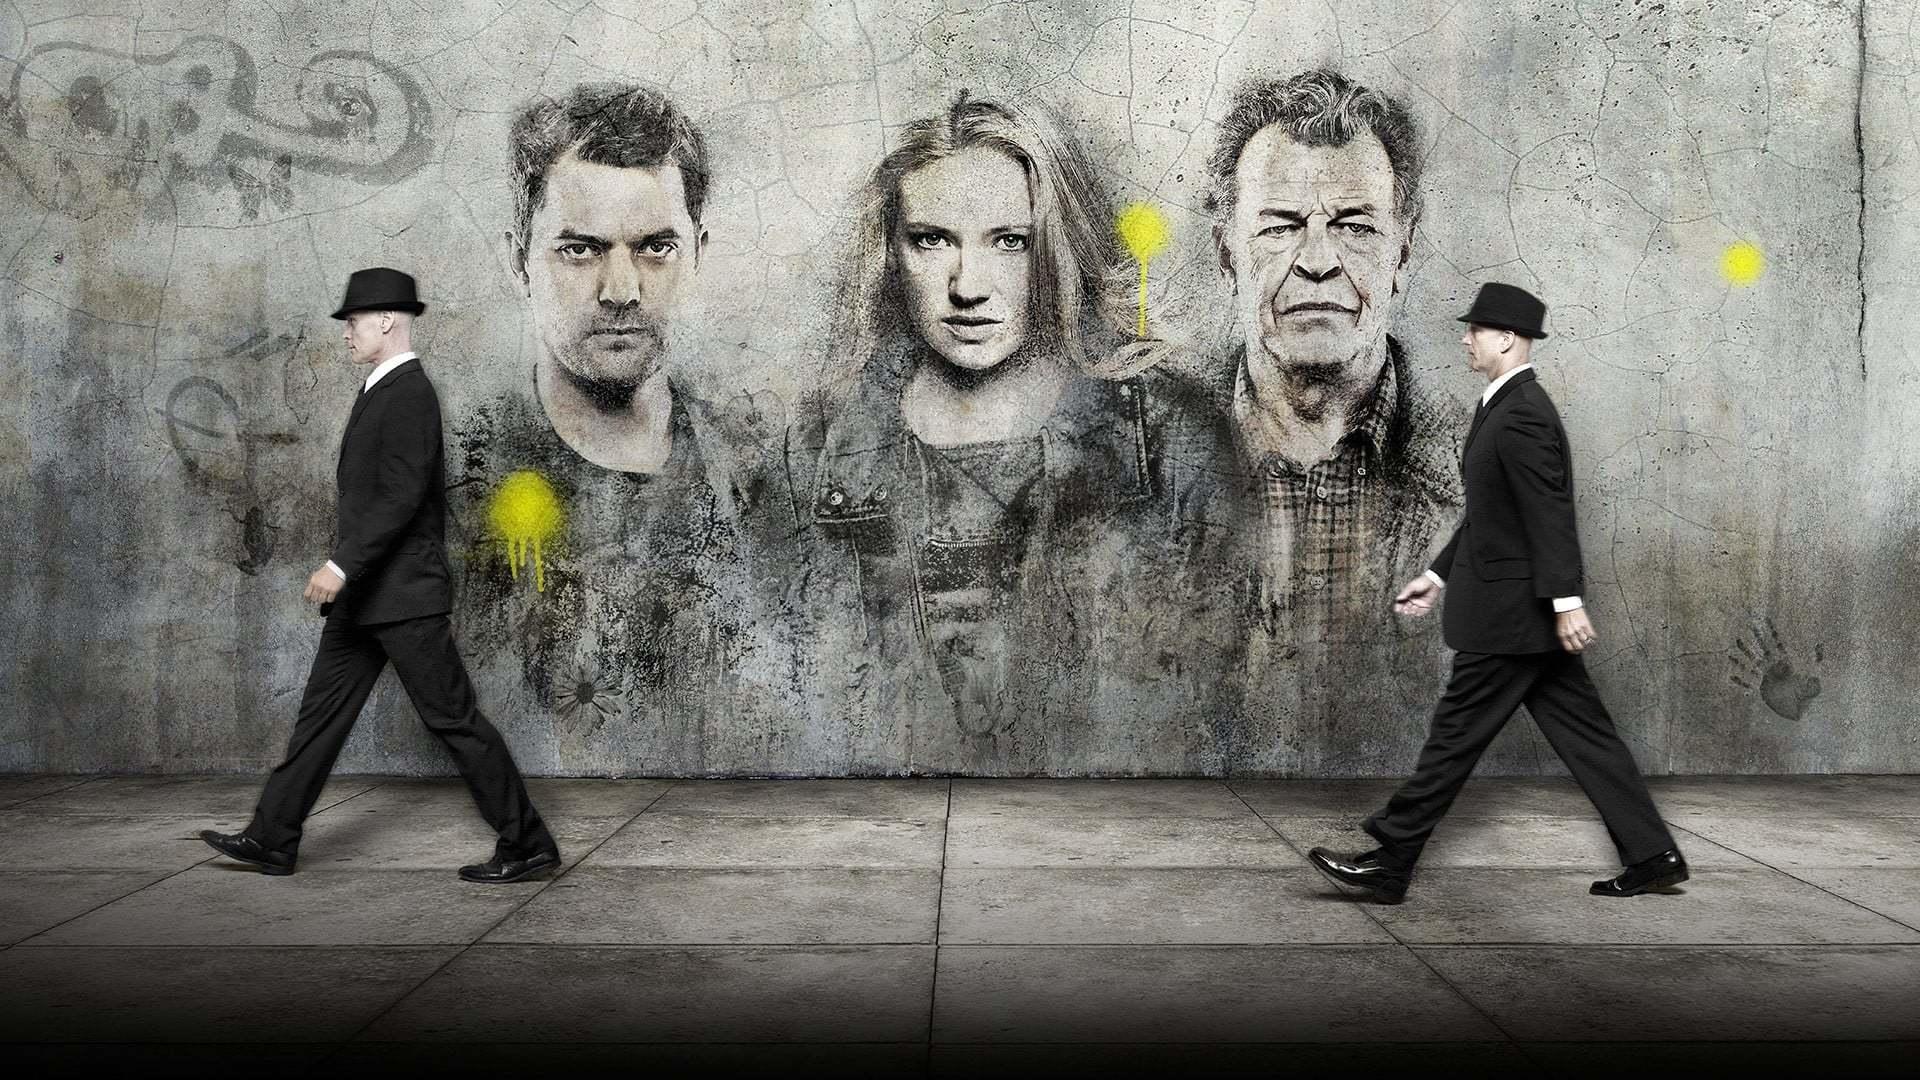 Кадры из фильма Грань Fringe 2008